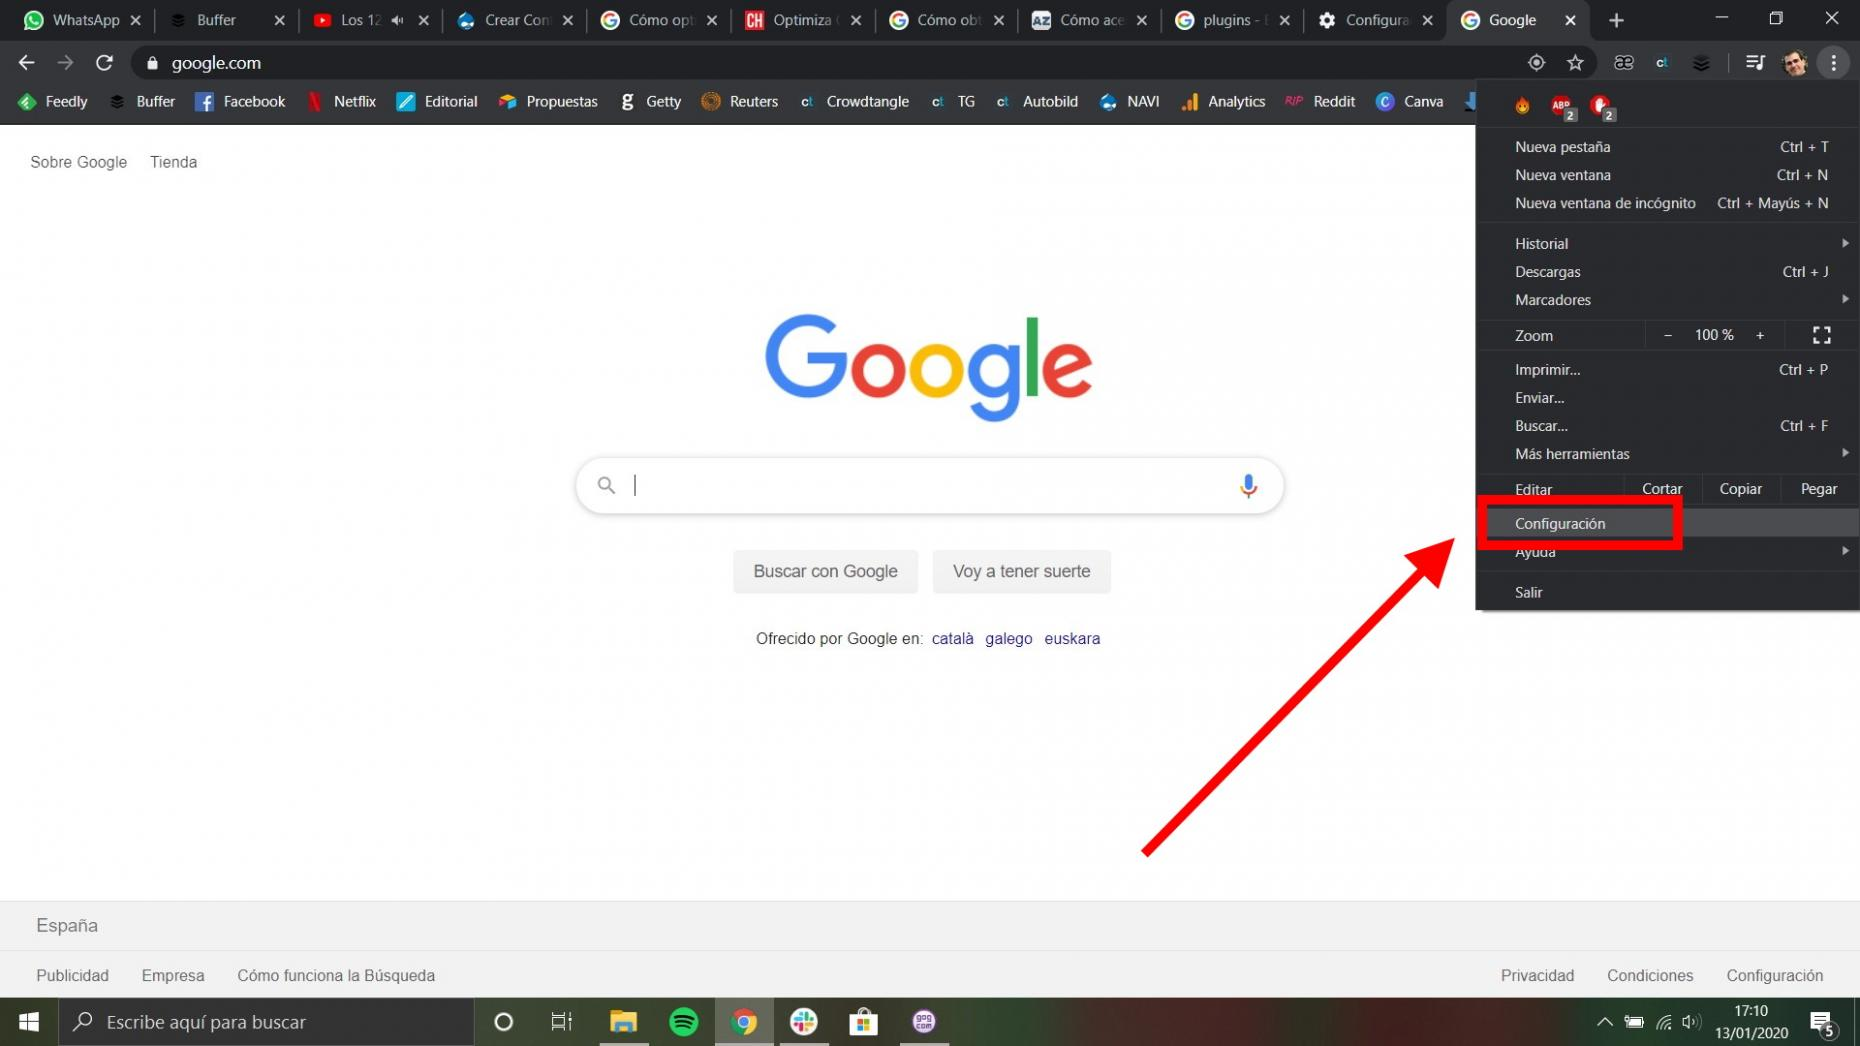 Cómo Optimizar Google Chrome Para Navegar Más Rápido Por Internet Business Insider España